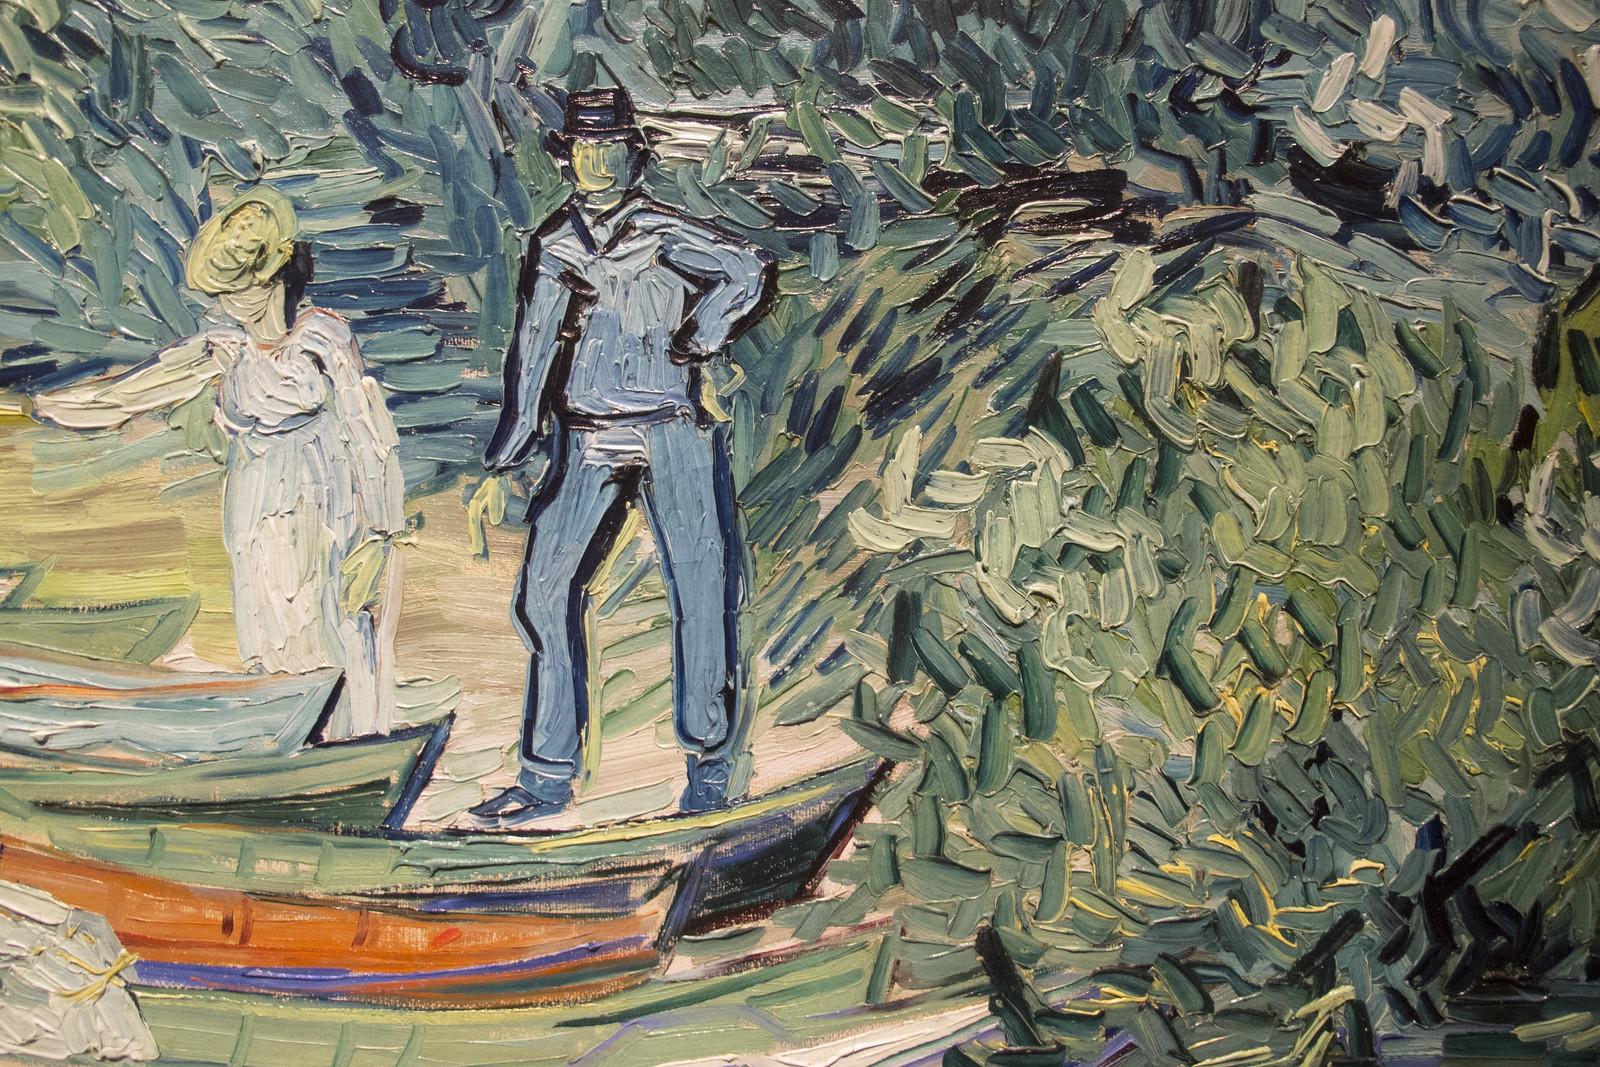 Van Gogh detail | by Martin Beek